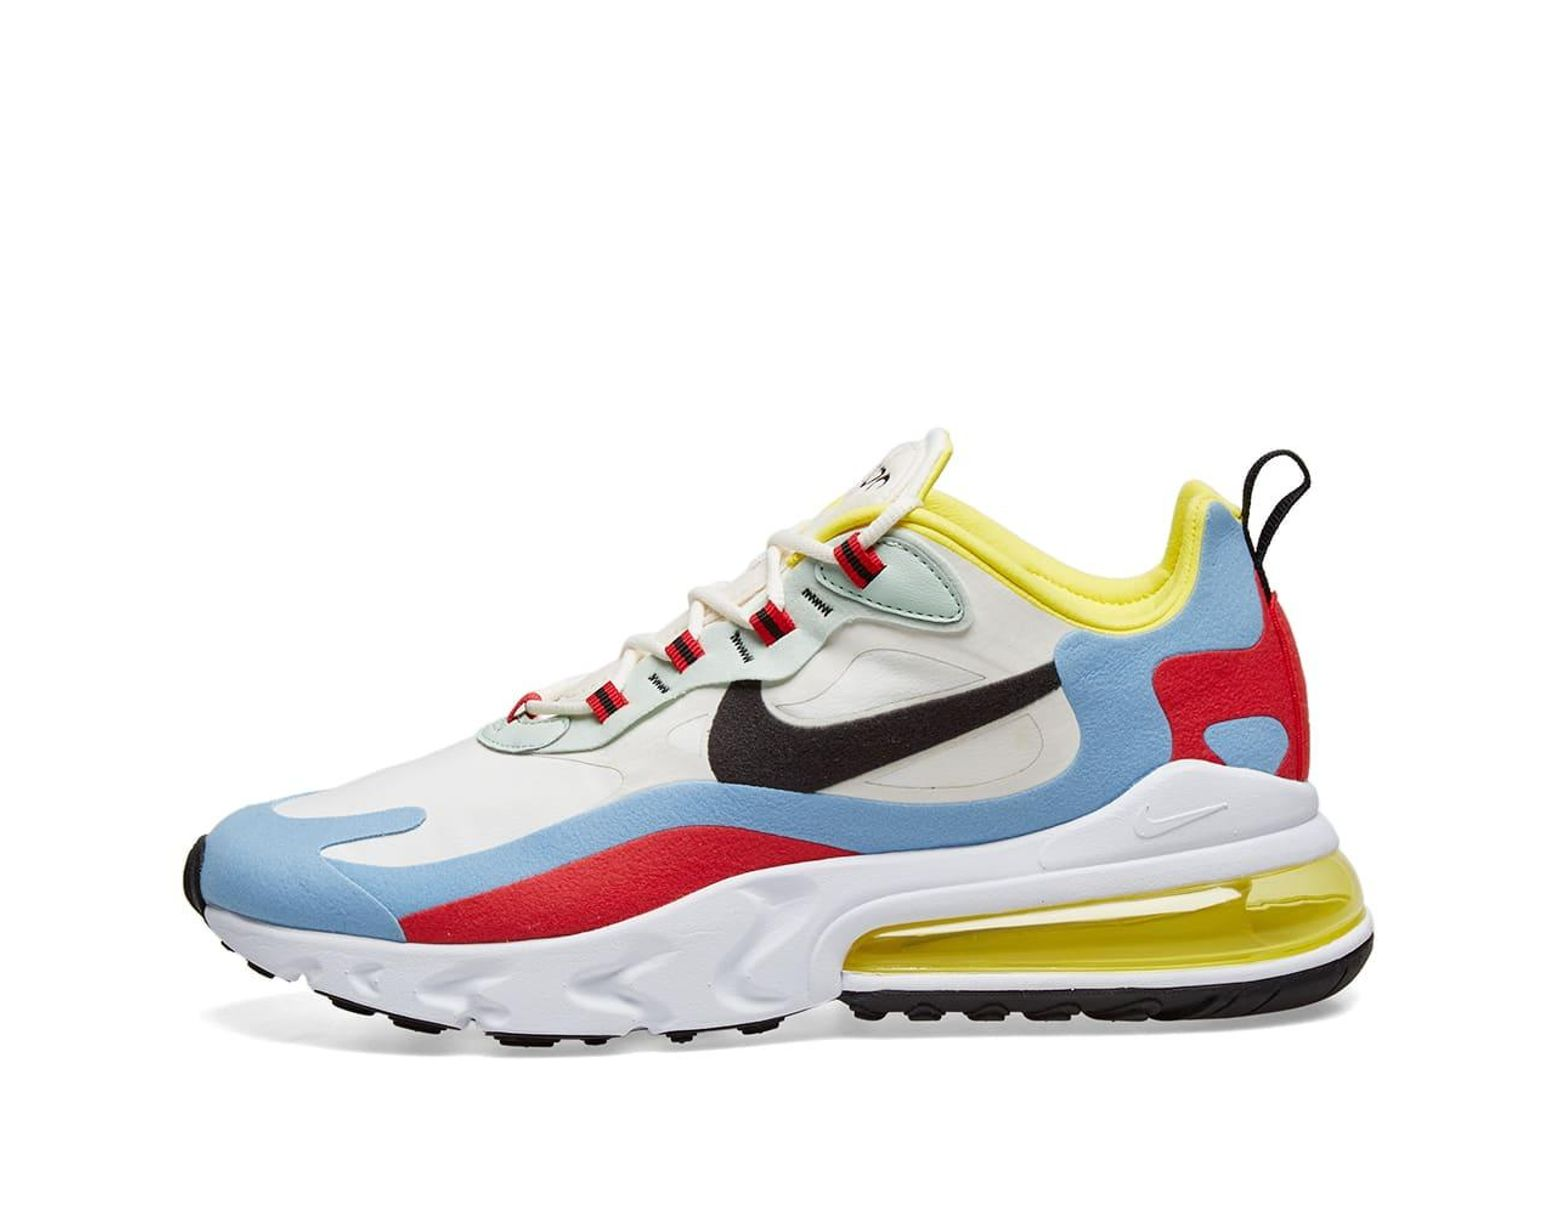 Nike Air Max 270 React (Optical) Women's Shoe. Nike LU